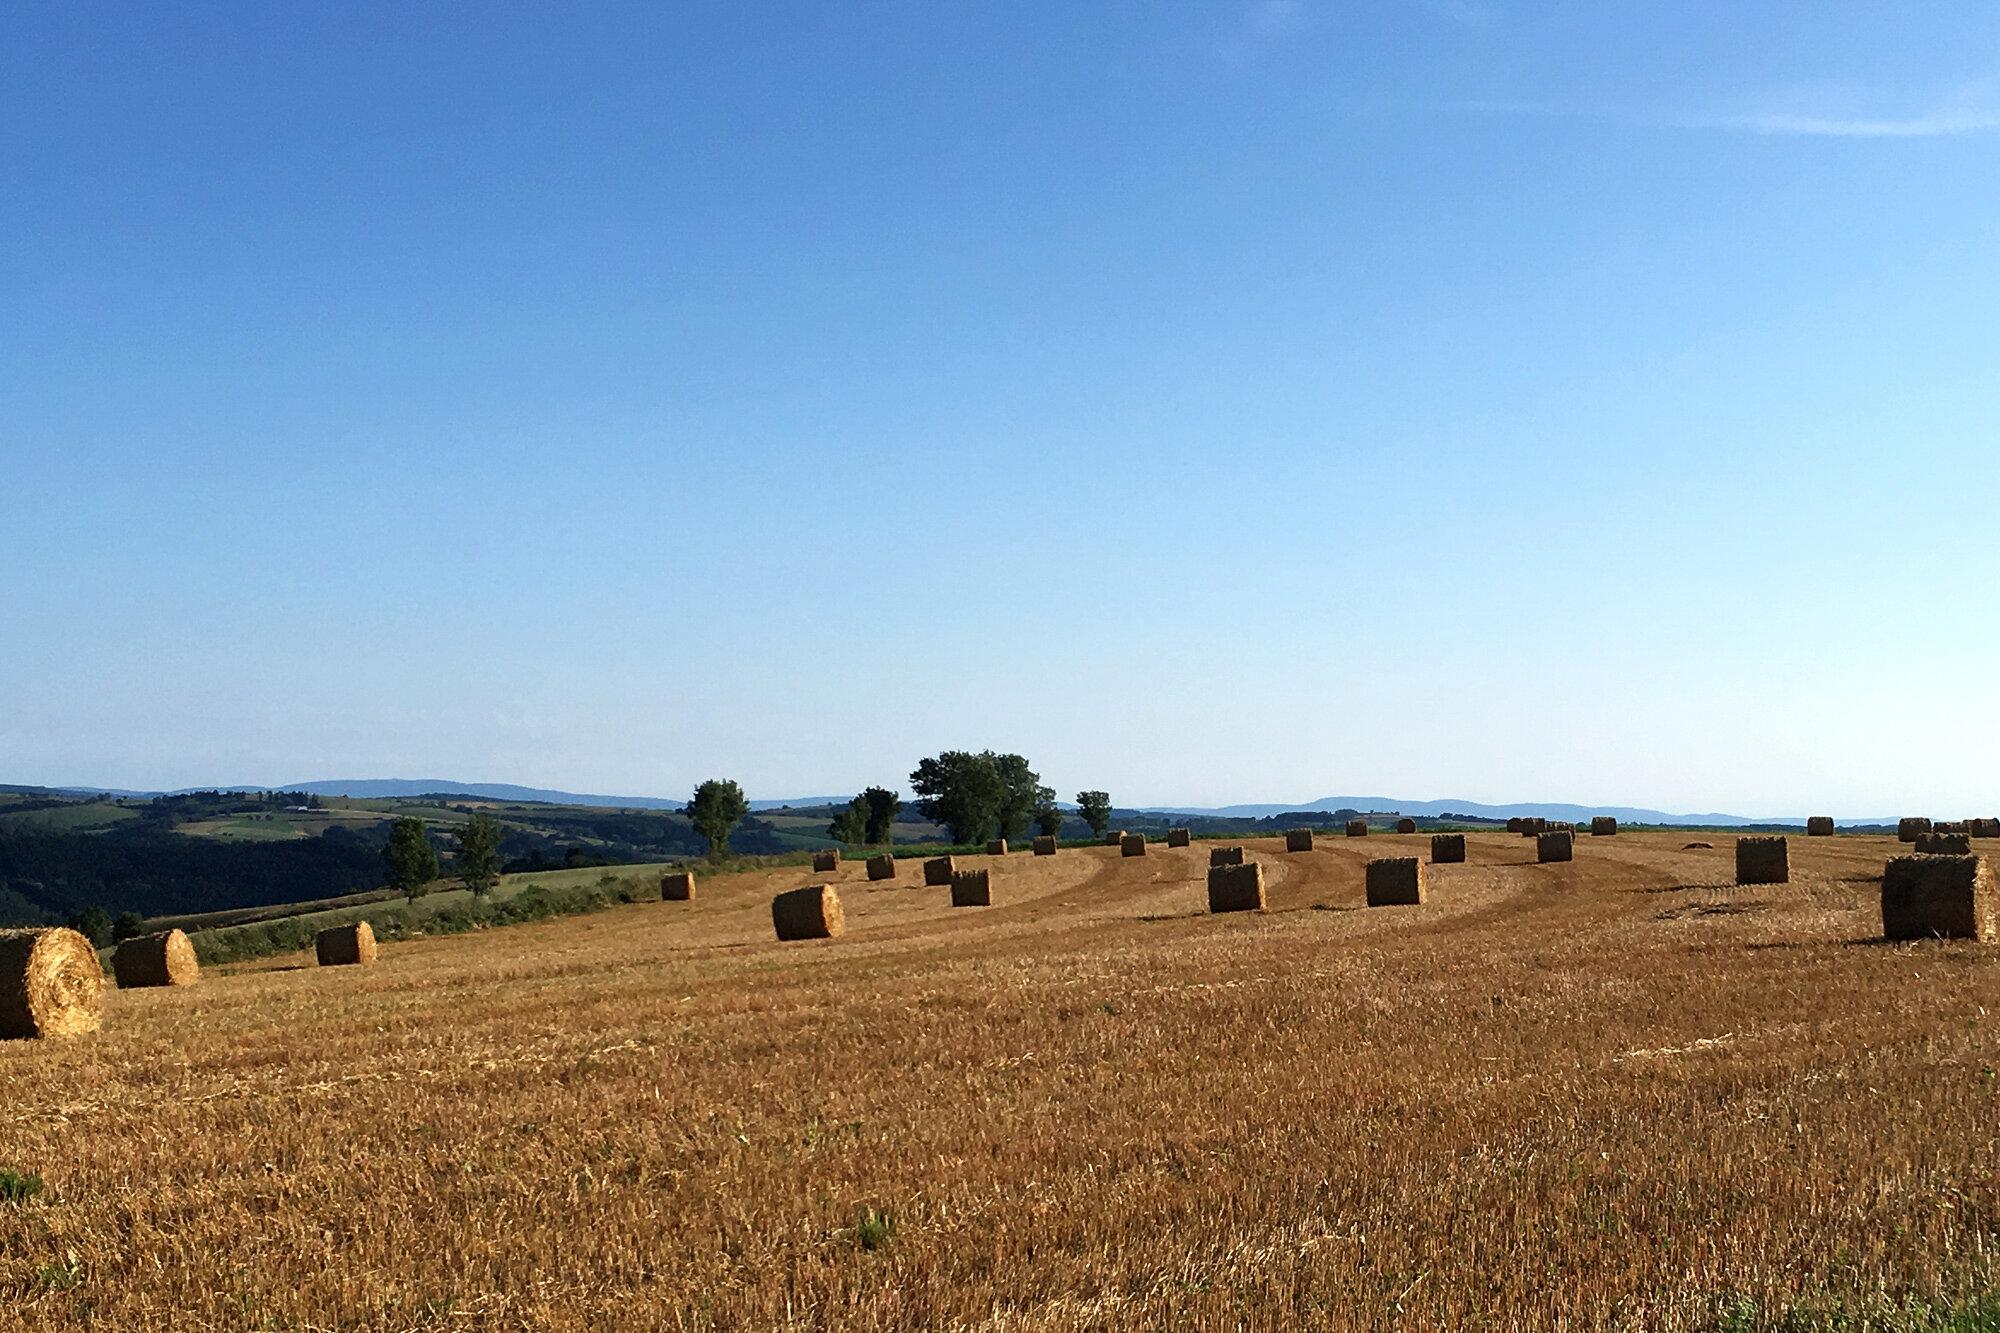 Field_Straw.jpg